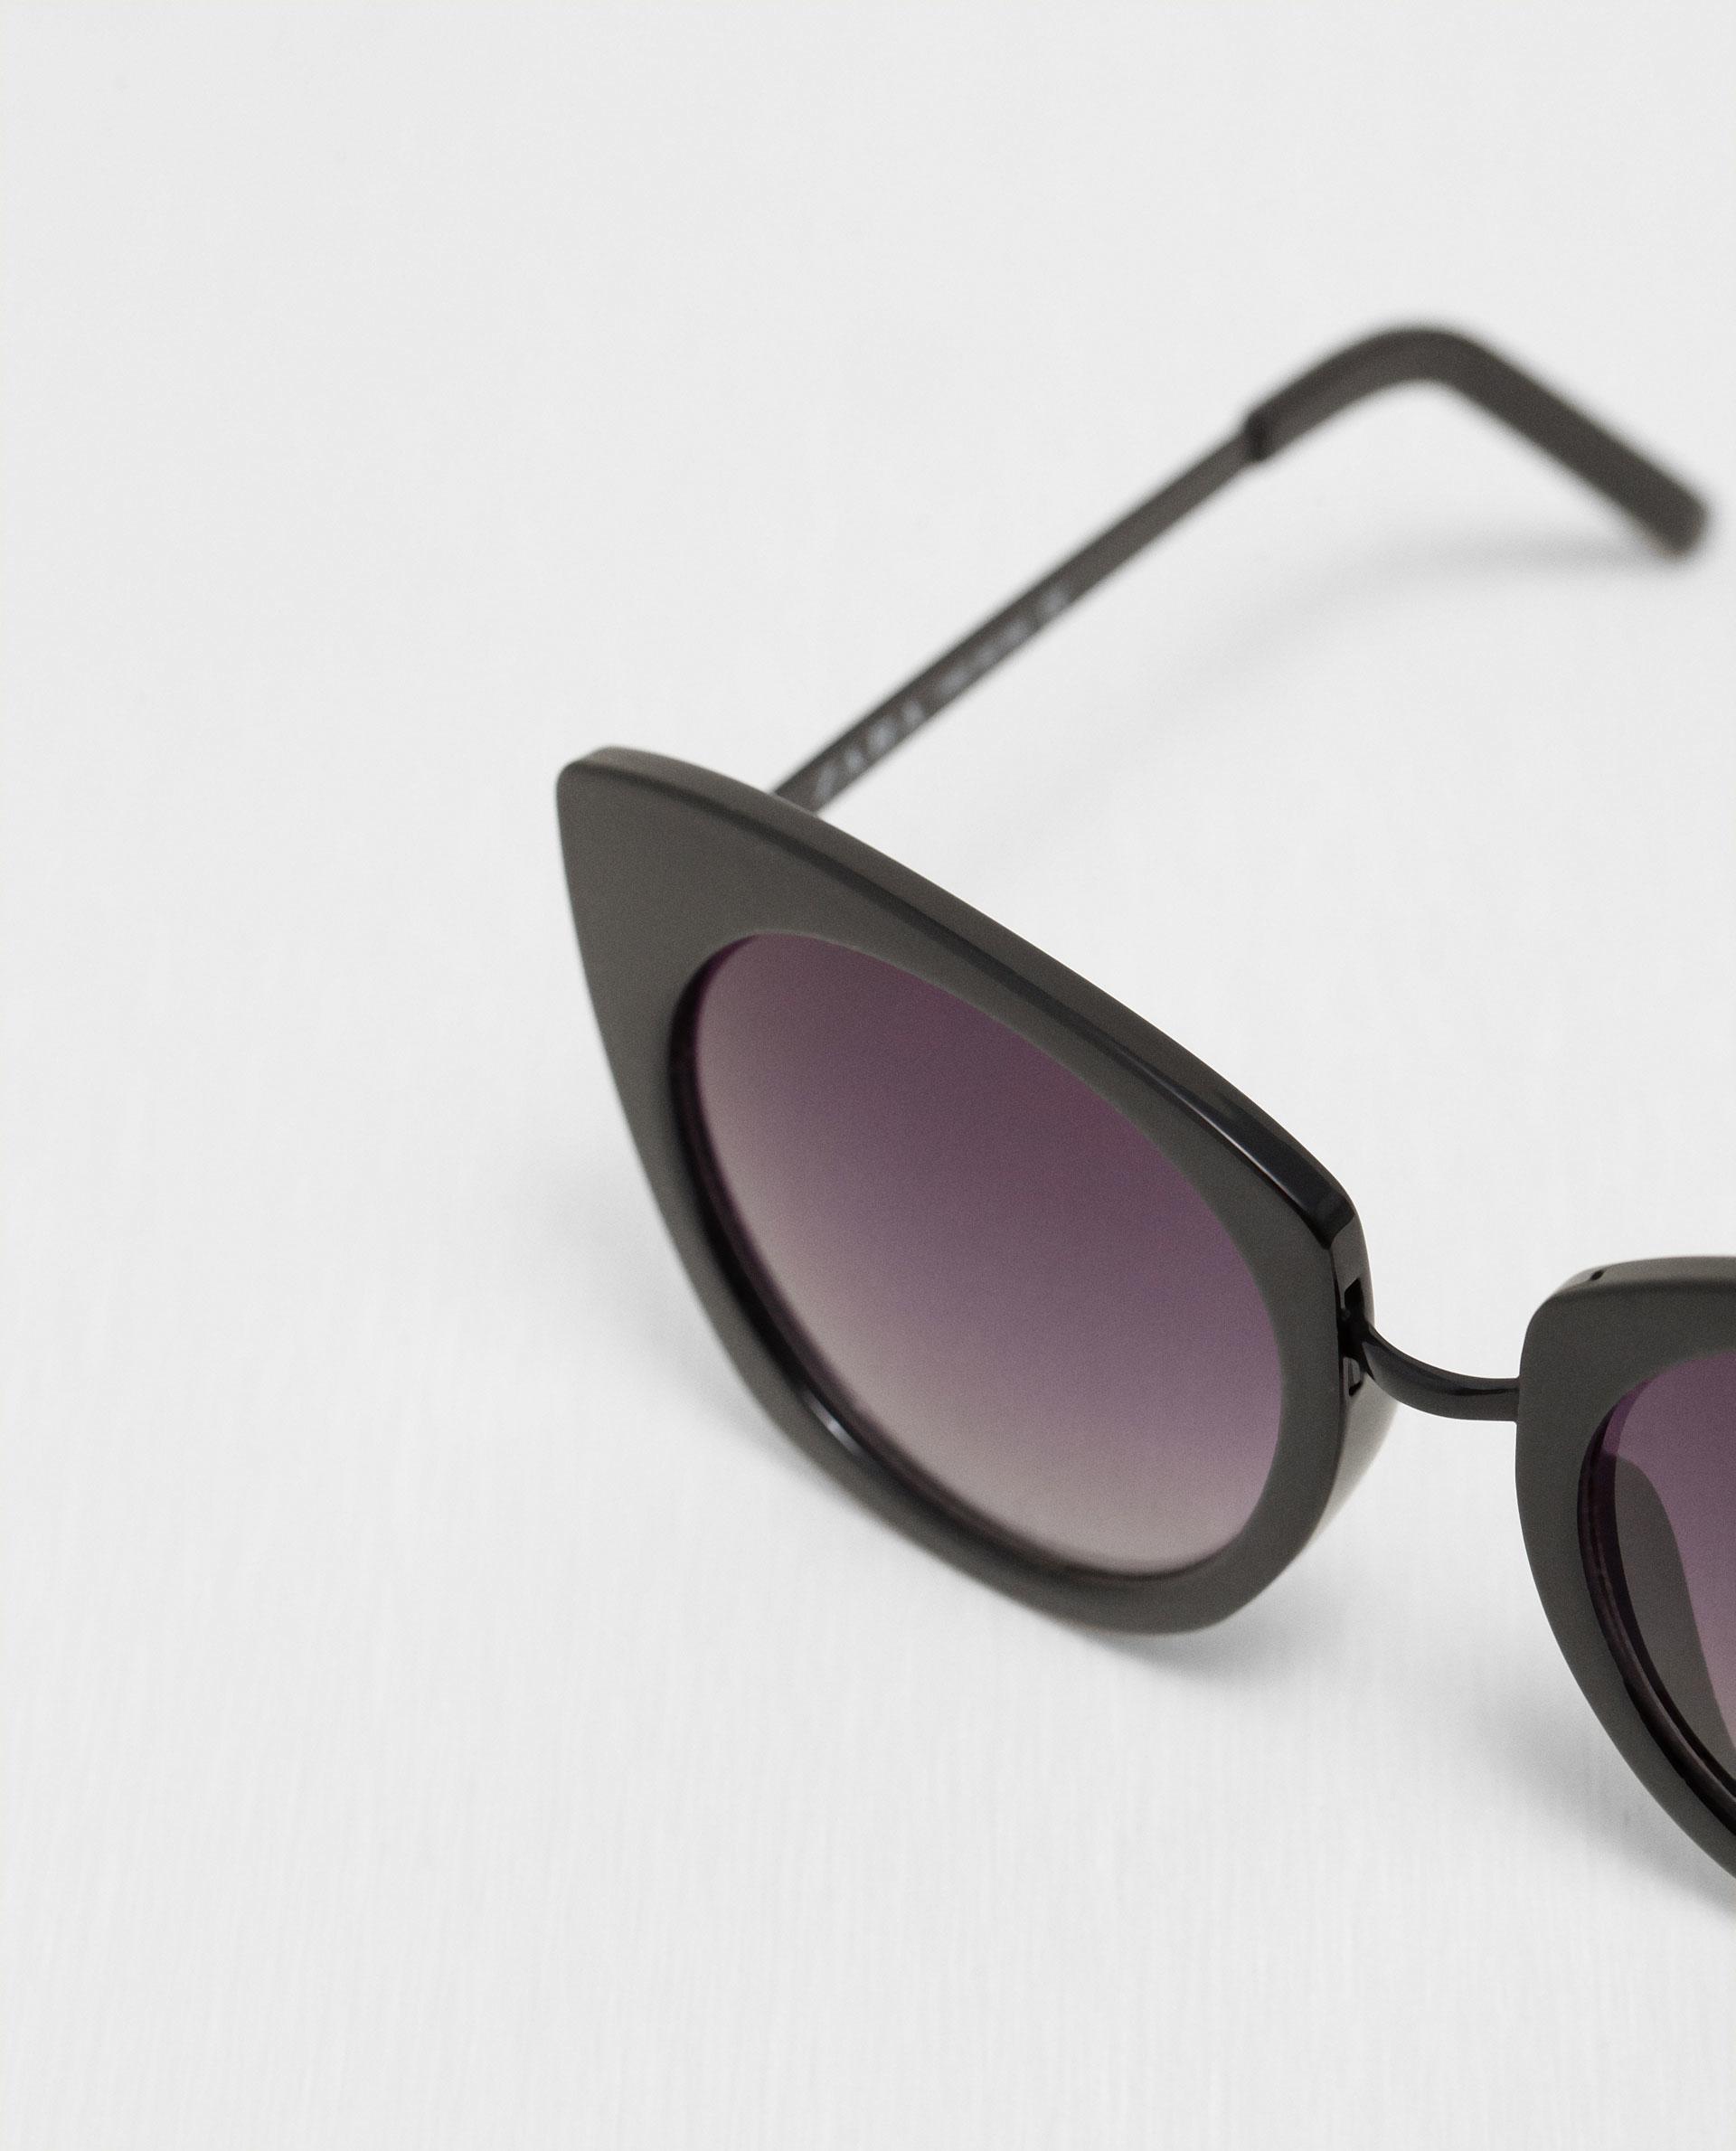 Zara Glasses Frames : Zara Glasses With Metallic Arms Lyst